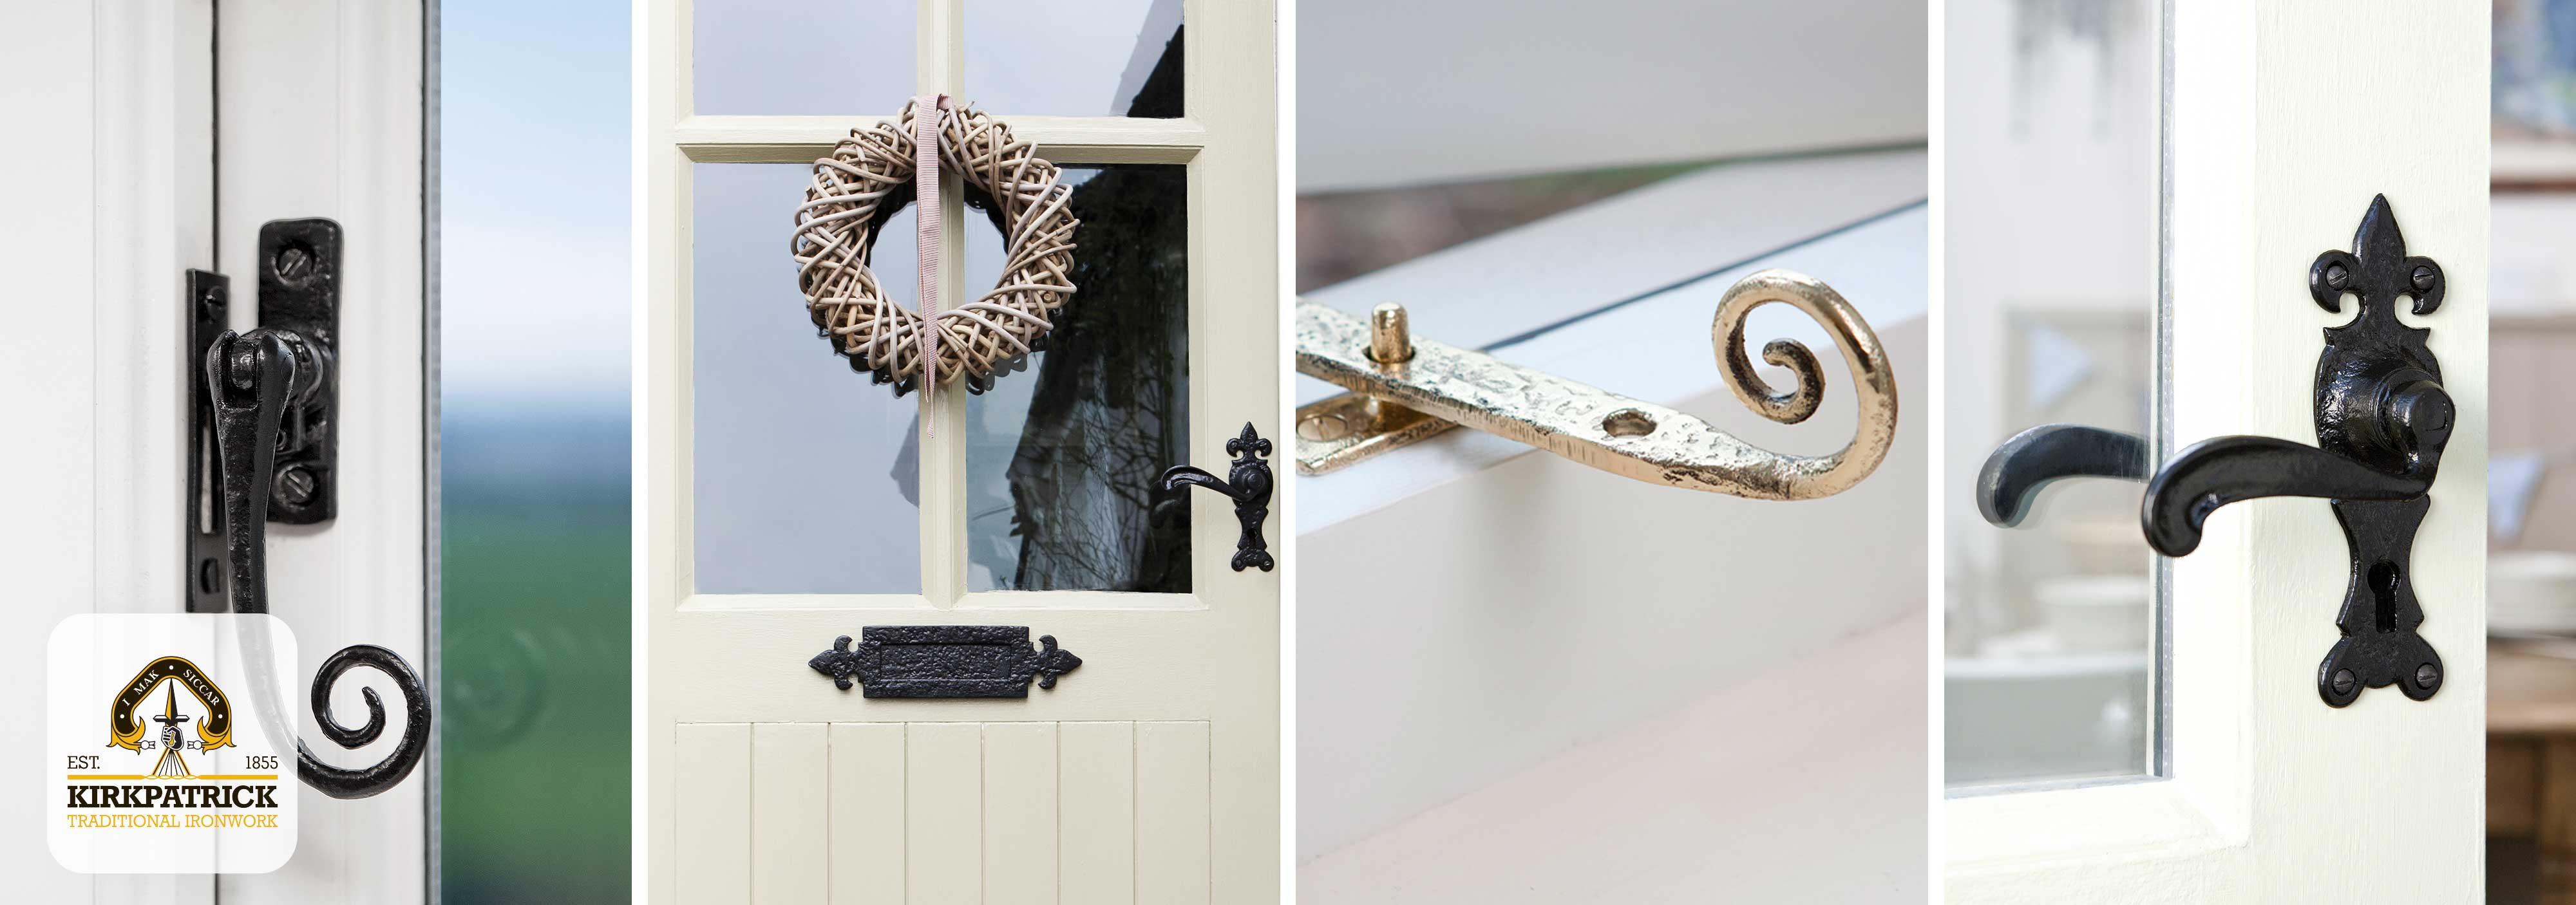 Het uitgebreide pakket van Kirkpatrick bevat deurbeslag, raambeslag, meubelbeslag en overige woonaccessoires